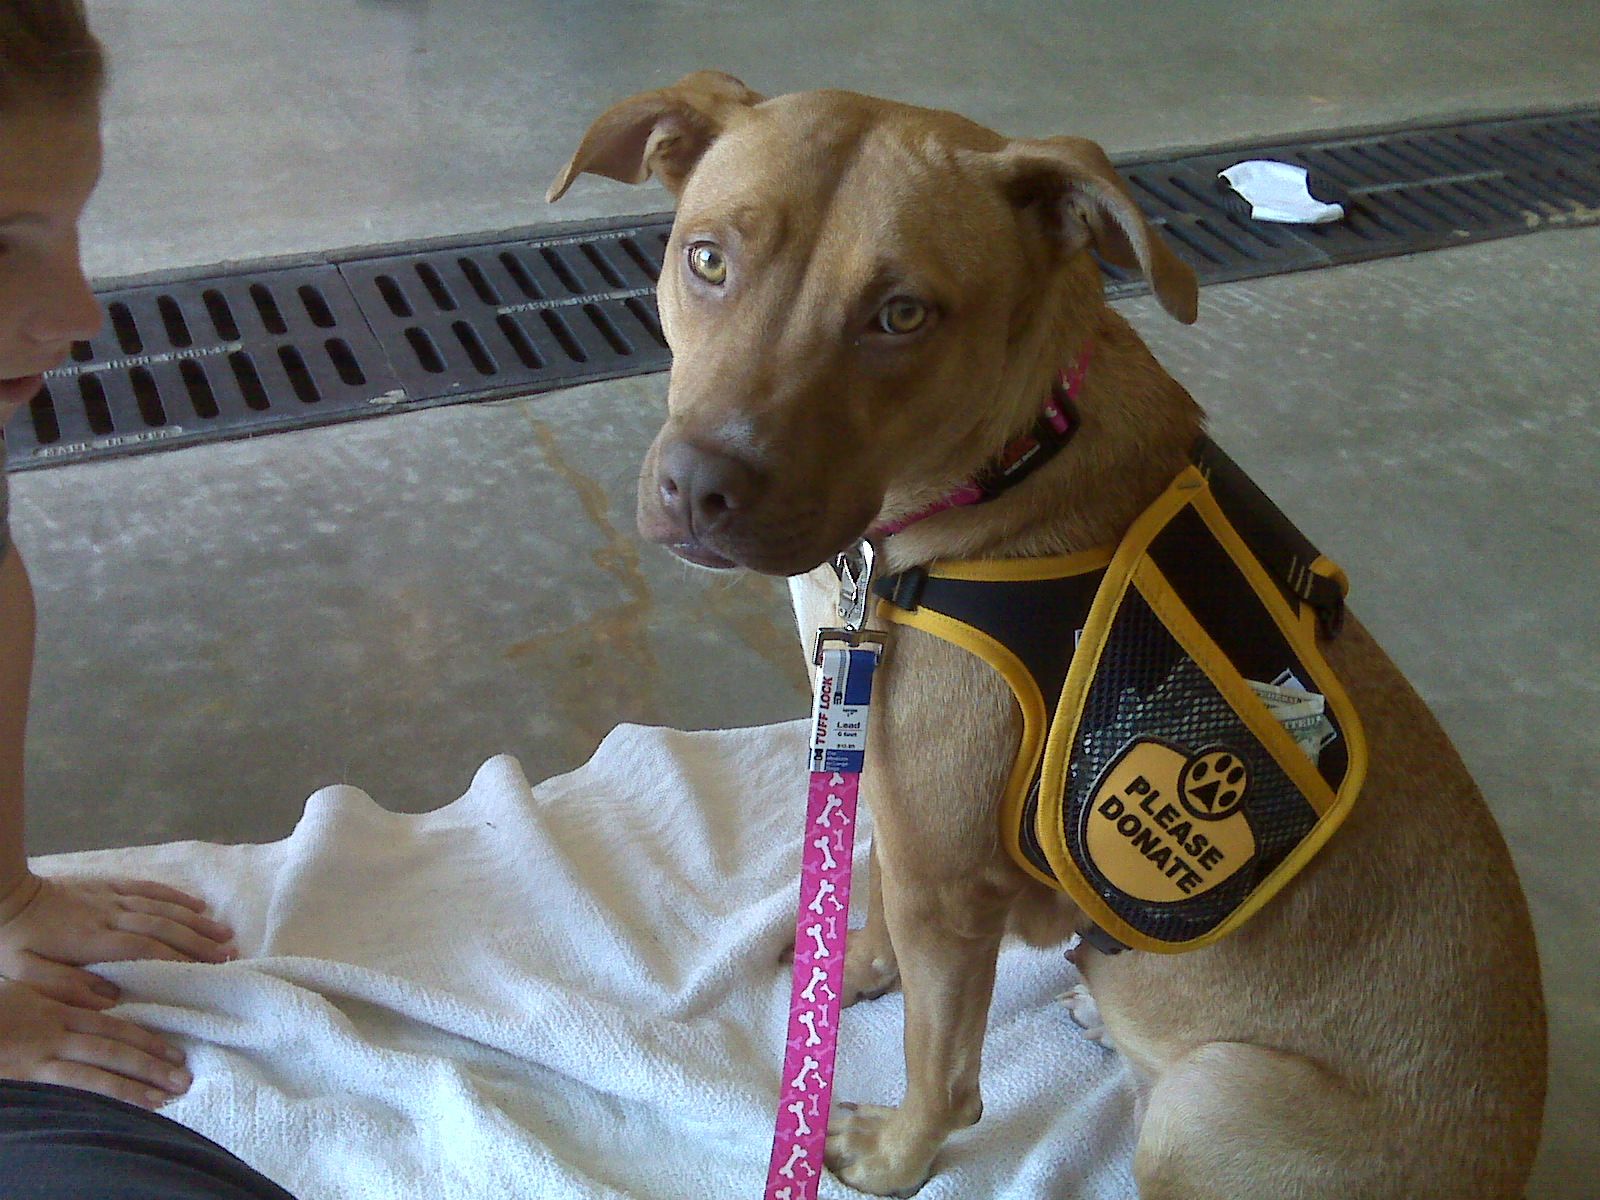 Pet Friendly Bryant Animal Control & Adoption Center